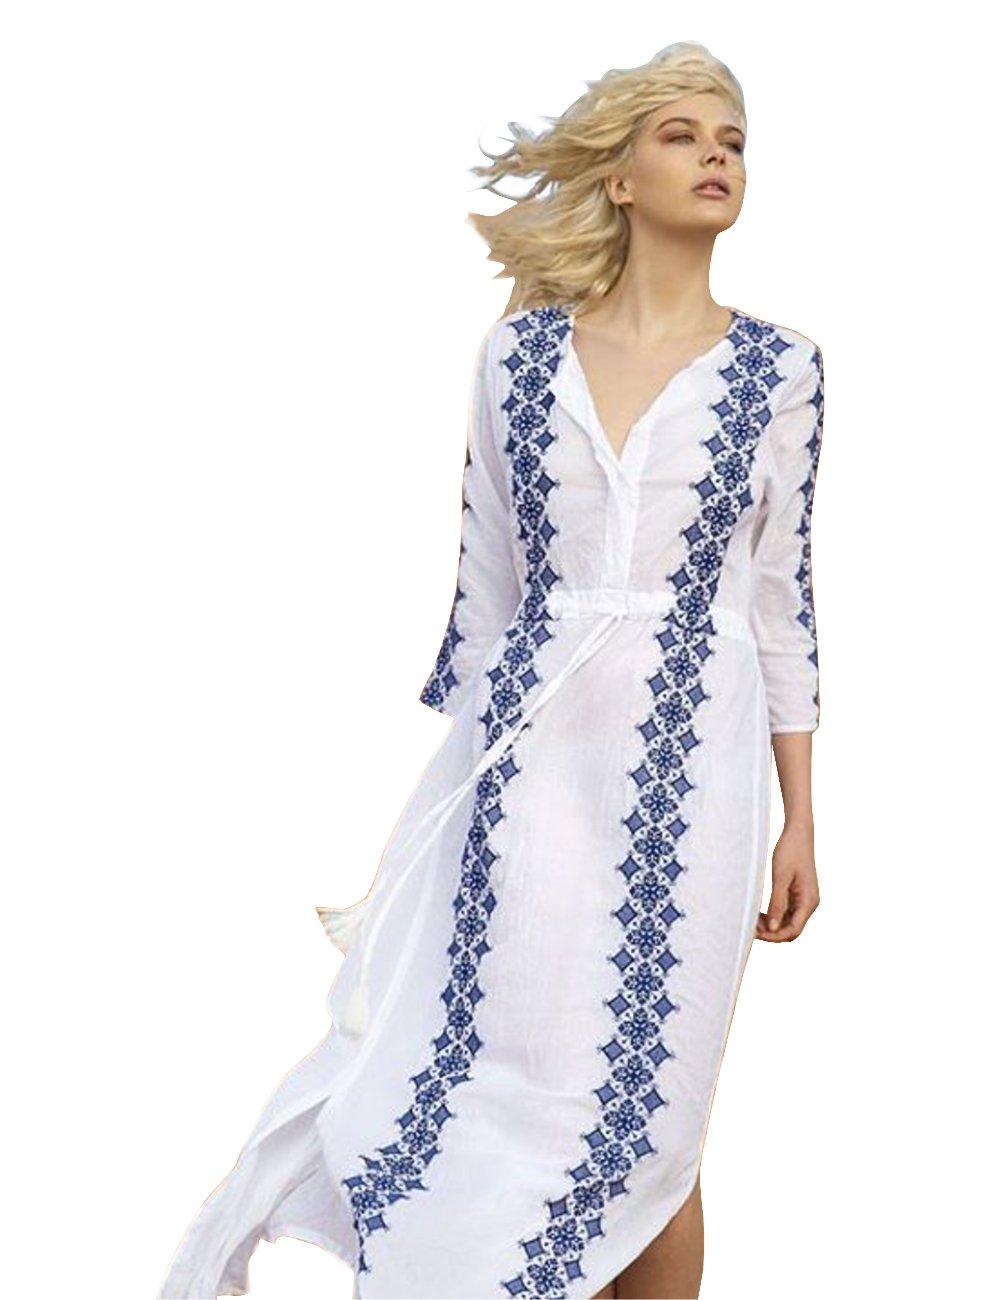 Sanifer Women's Embroidered Print Bohemian Maxi Beach Dress Long Beach Swimsuit Cover up Dress (Blue)